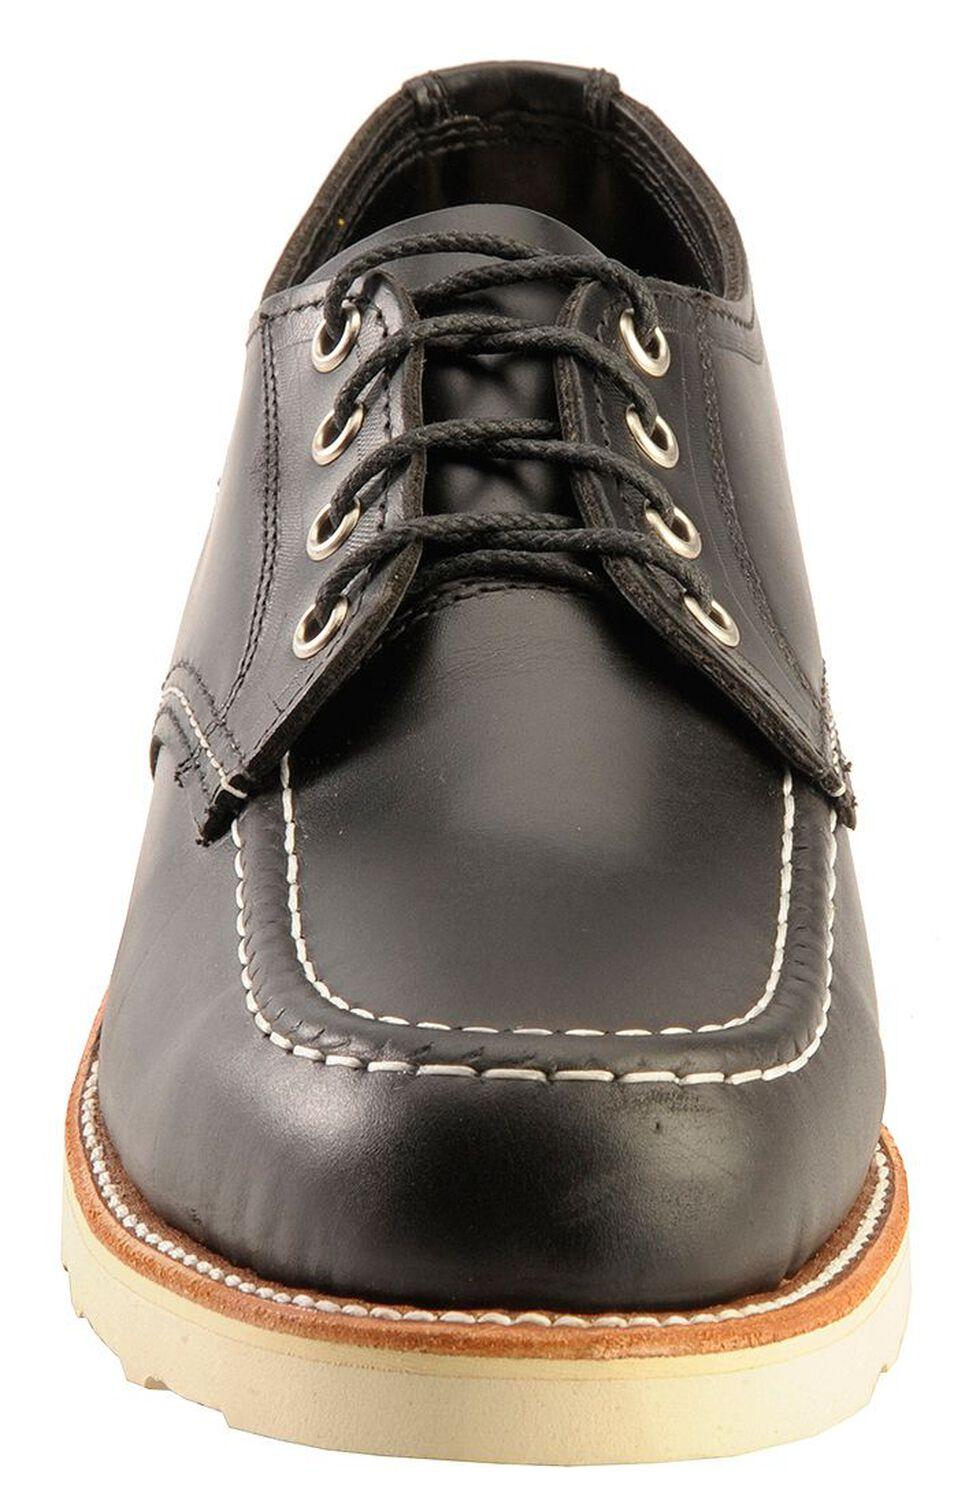 Chippewa Men's Black Whirlwind Oxford Shoes, Black, hi-res